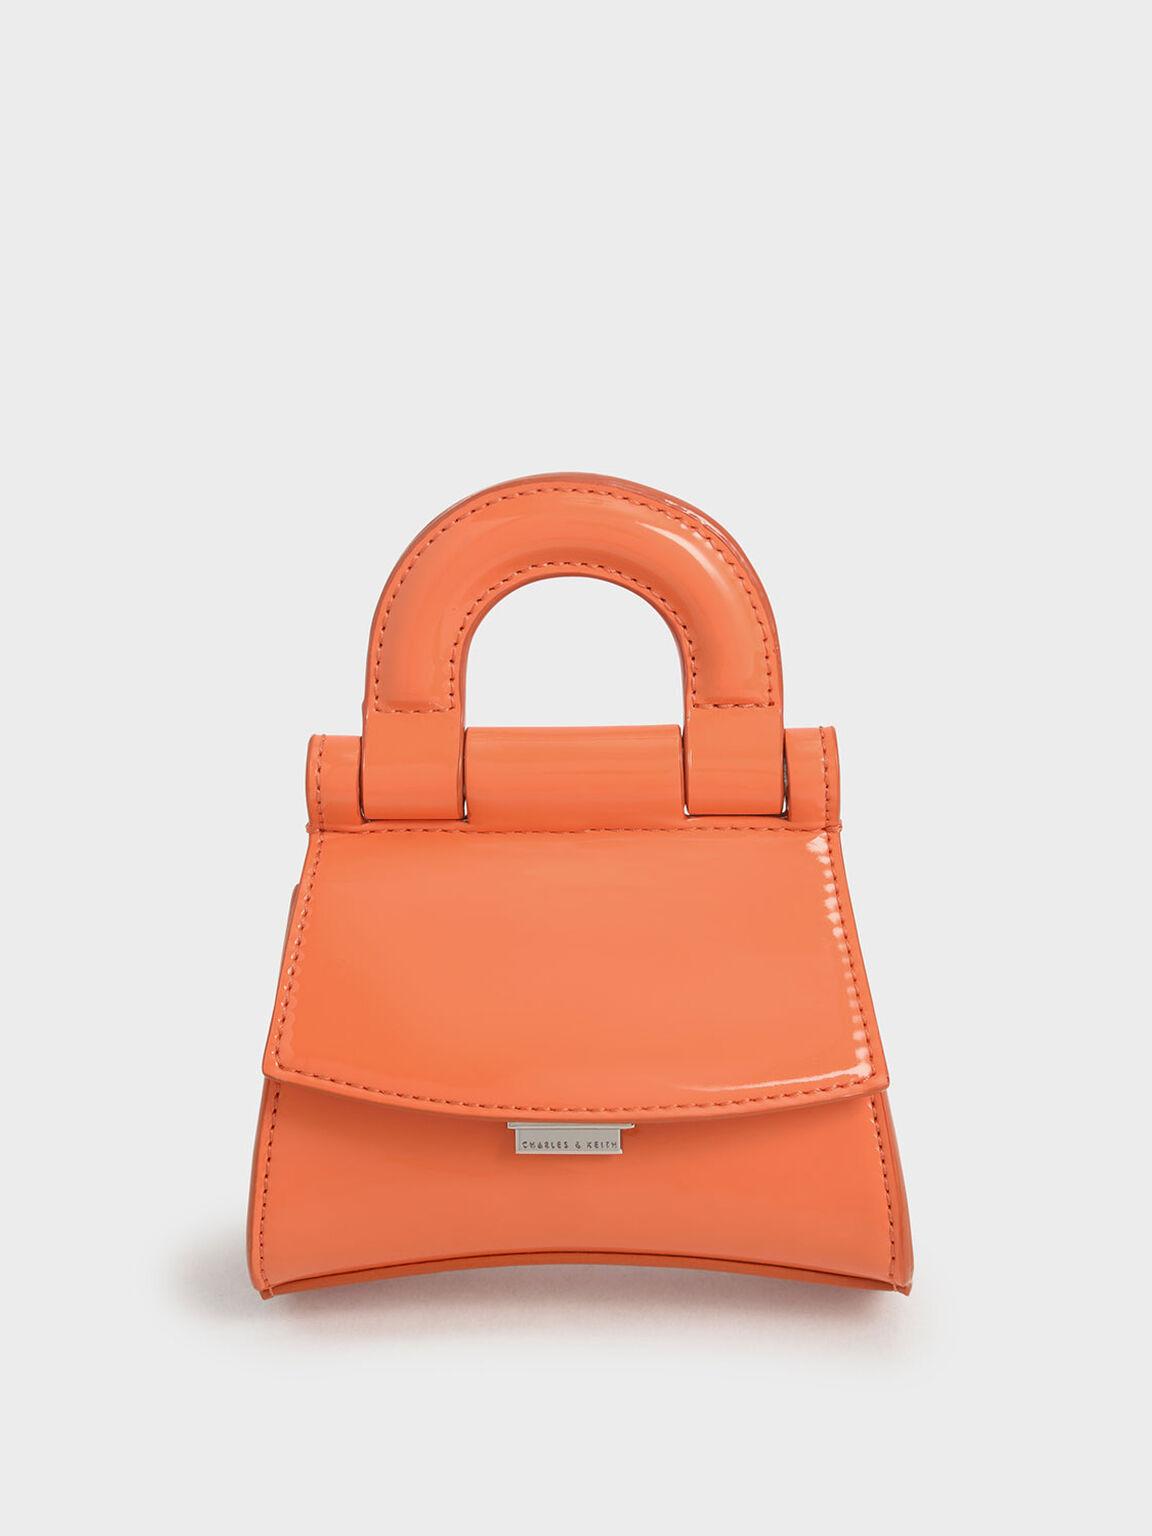 迷你手提包, 橘色, hi-res